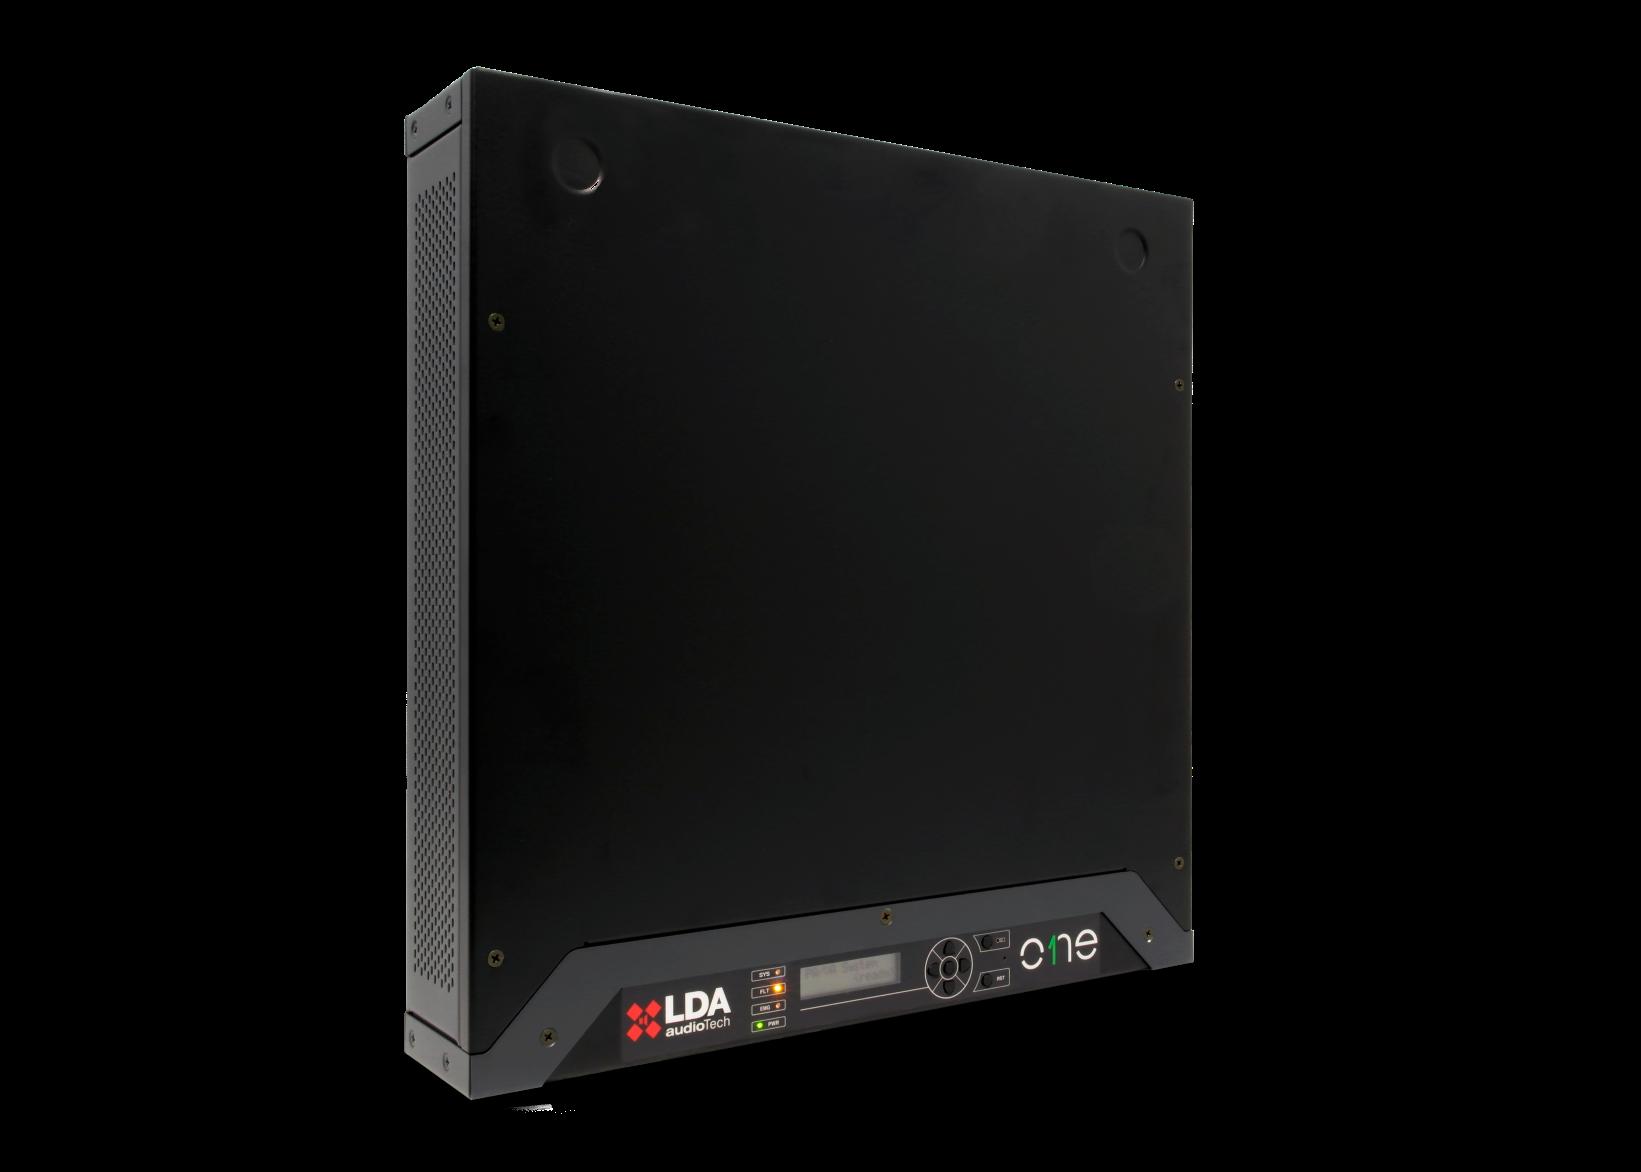 LDA ONE-500